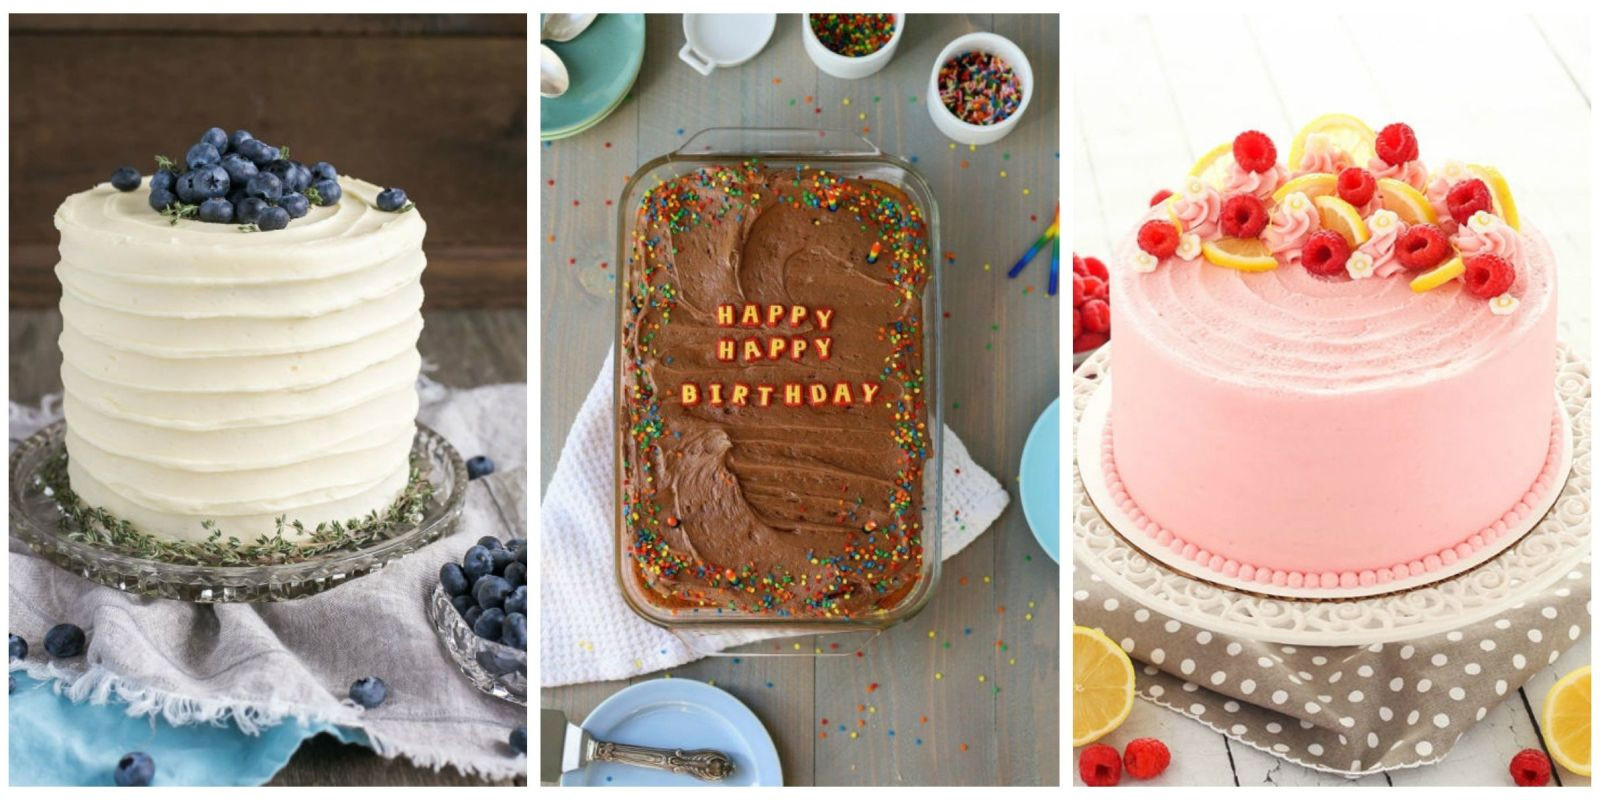 Homemade Birthday Cake Ideas  22 Homemade Birthday Cake Ideas Easy Recipes for